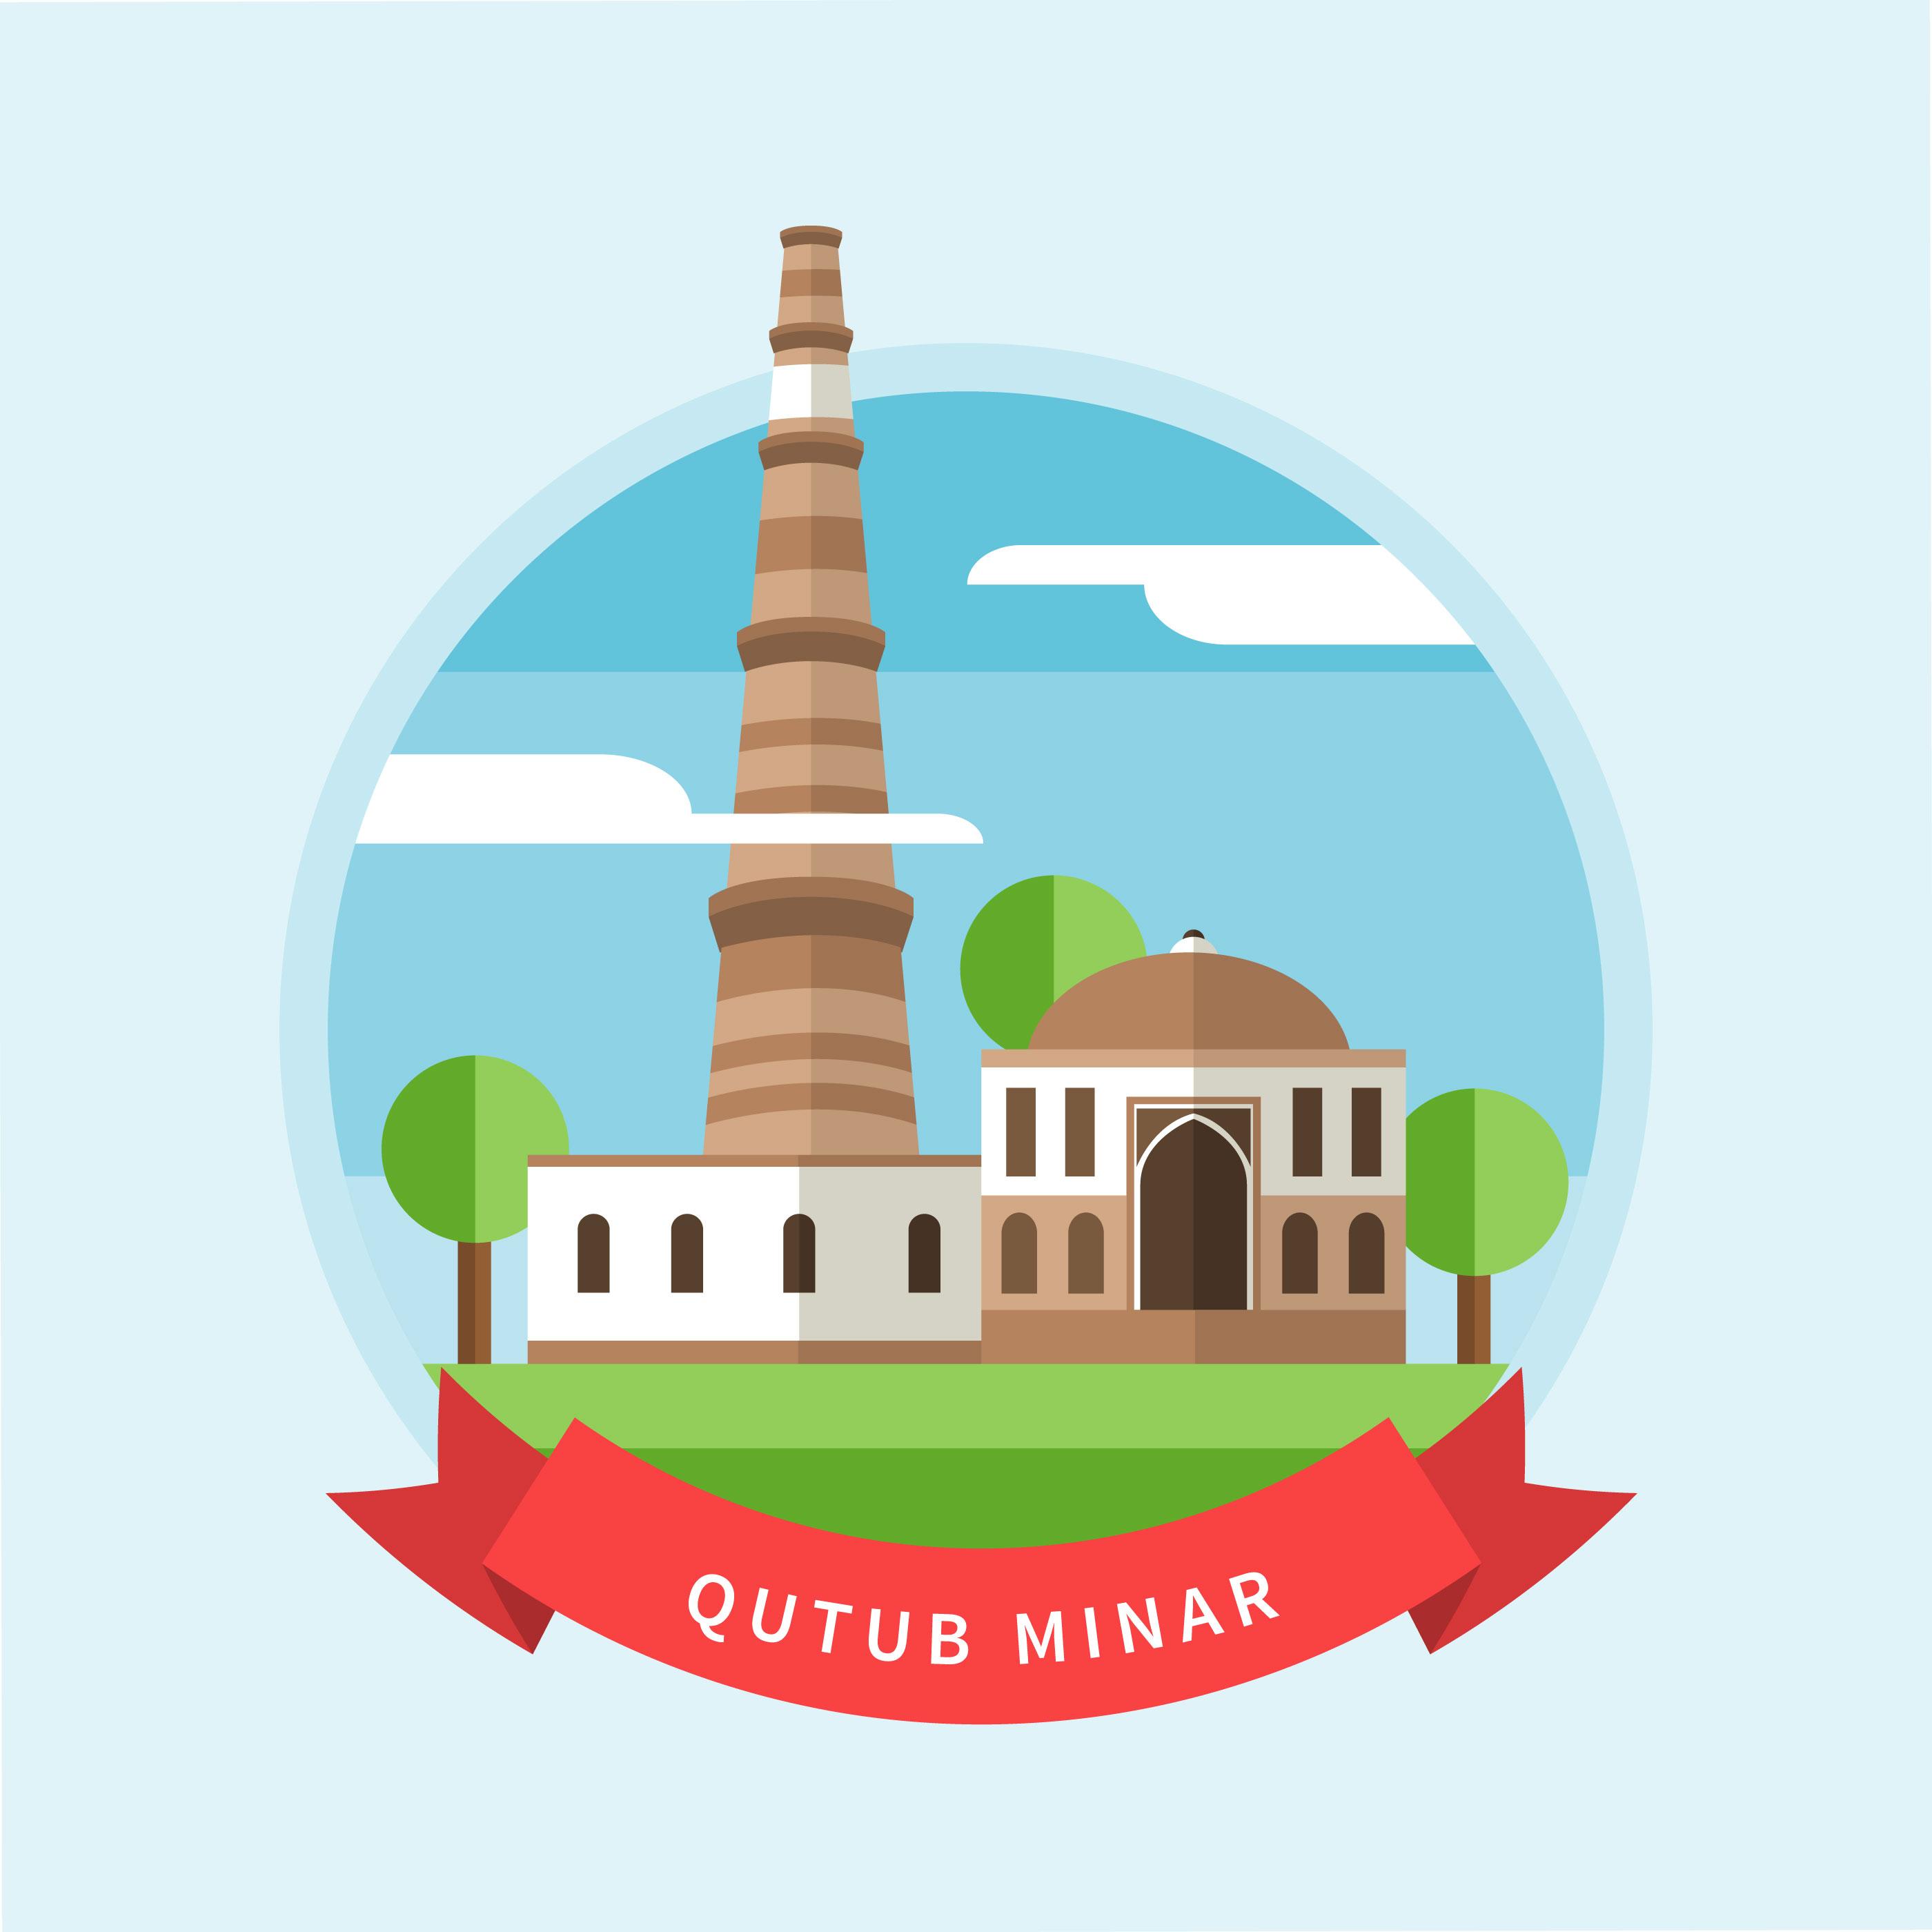 Line Drawing Of Qutub Minar : Qutub minar vector illustration download free art